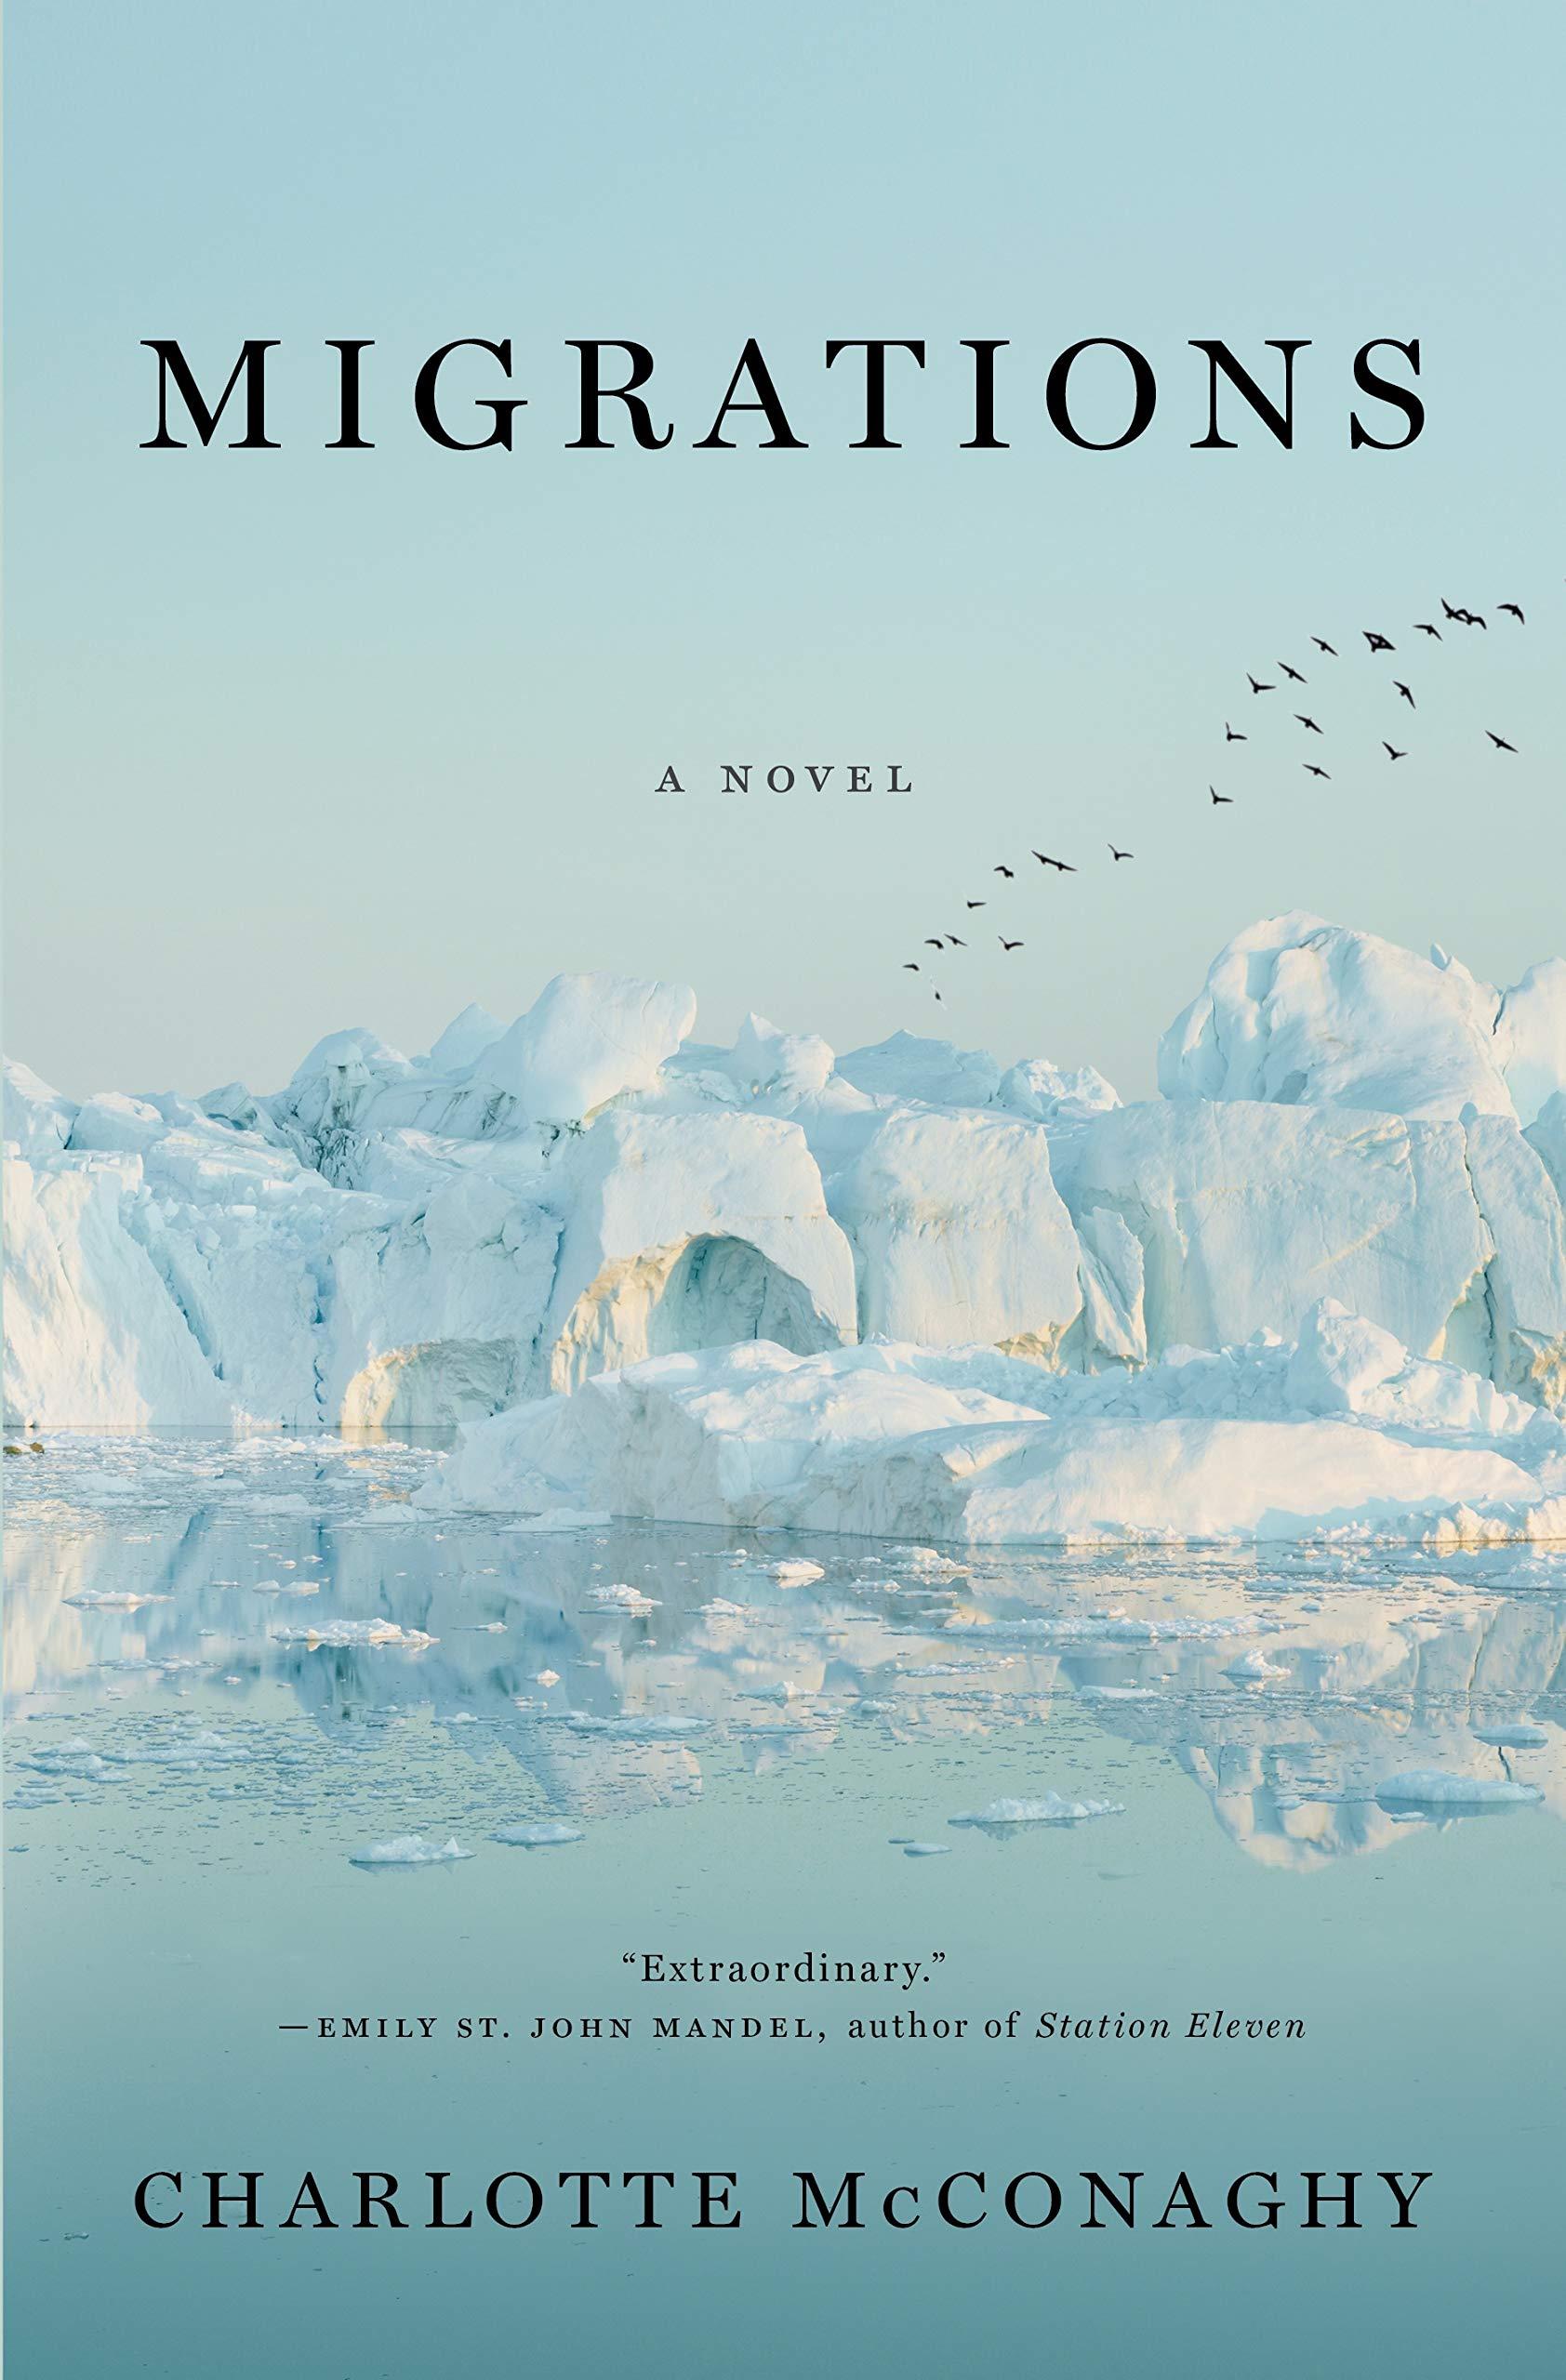 Amazon.com: Migrations: A Novel (9781250204028): McConaghy, Charlotte: Books